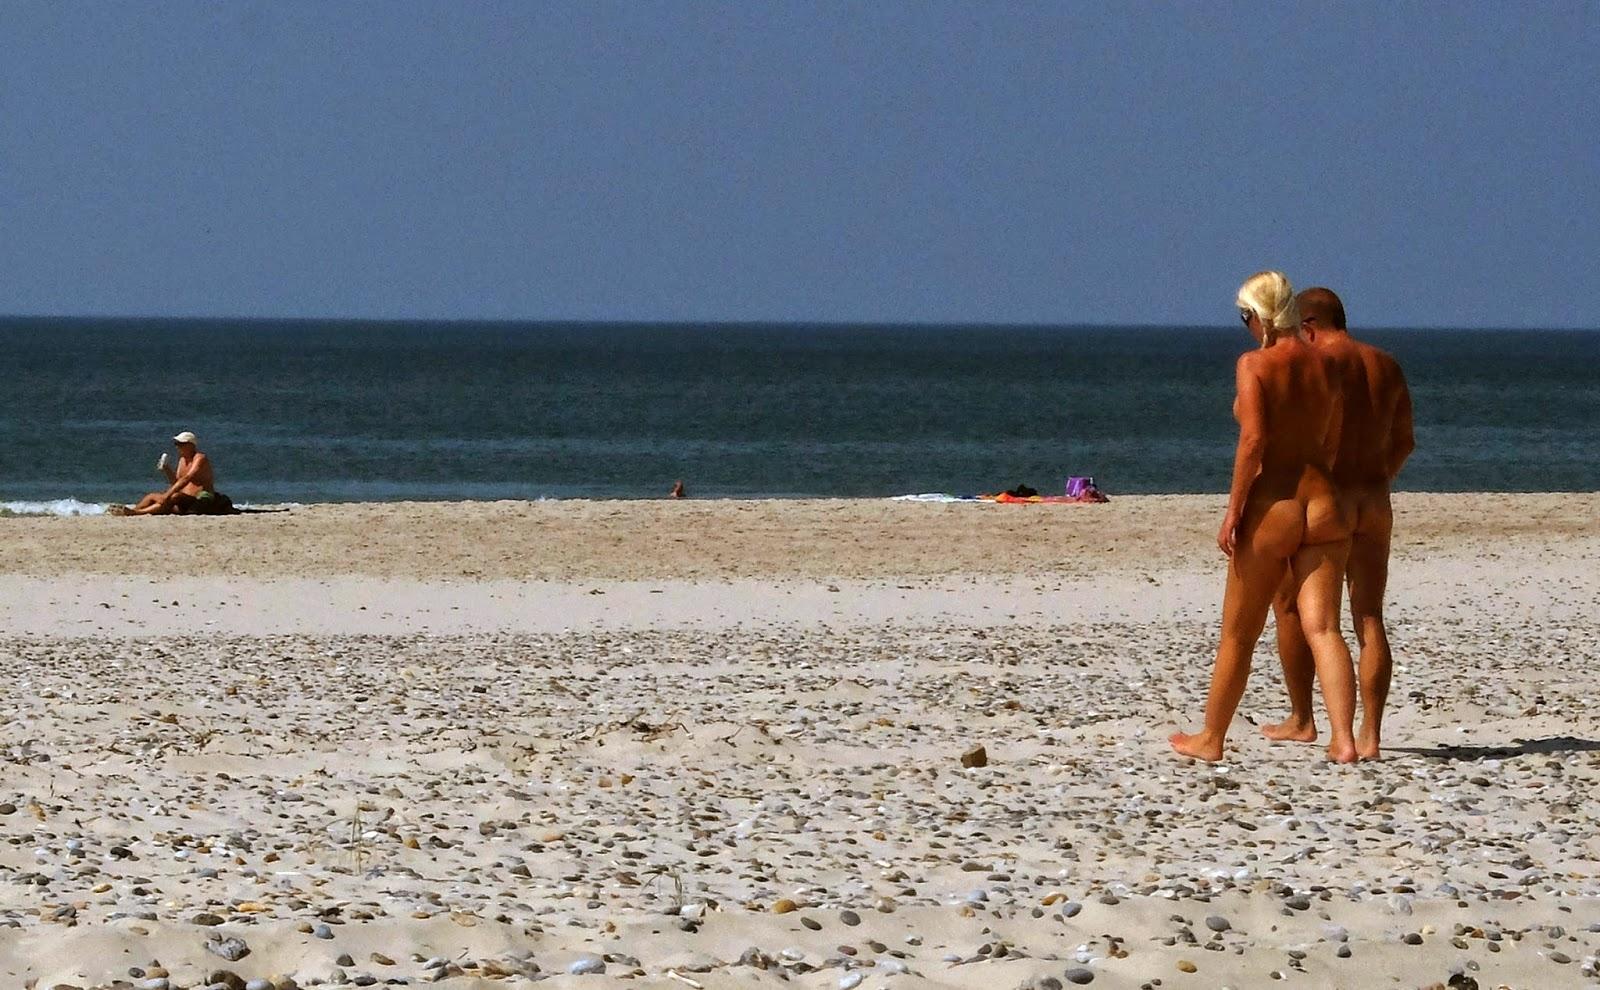 eskortside Houstrup strand naturist